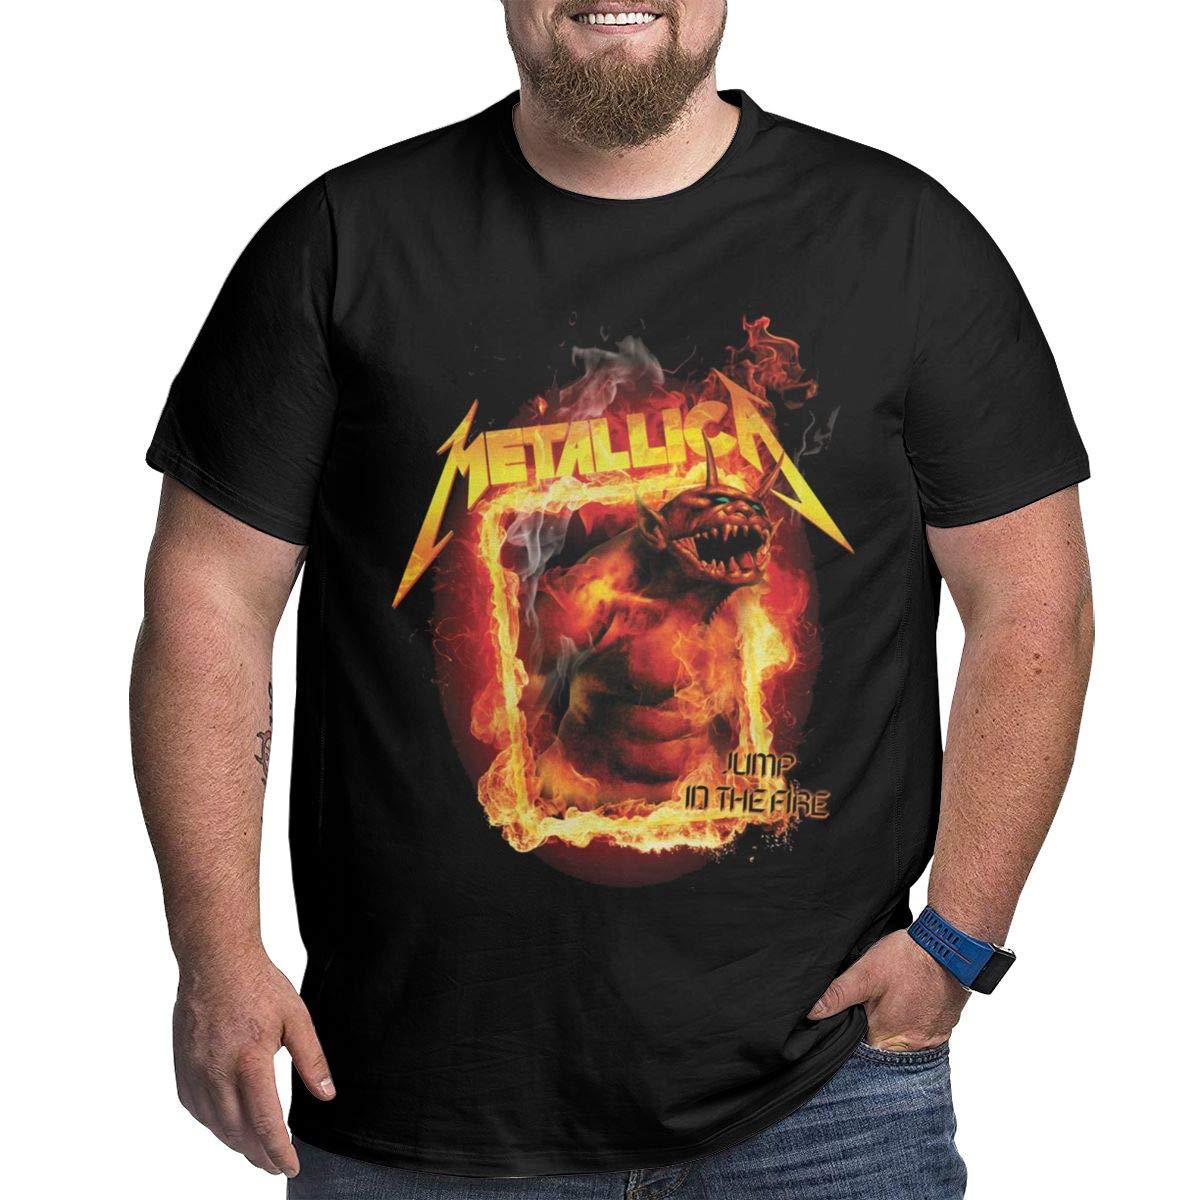 Llskaklvva Metallica Big T Shirt 1308